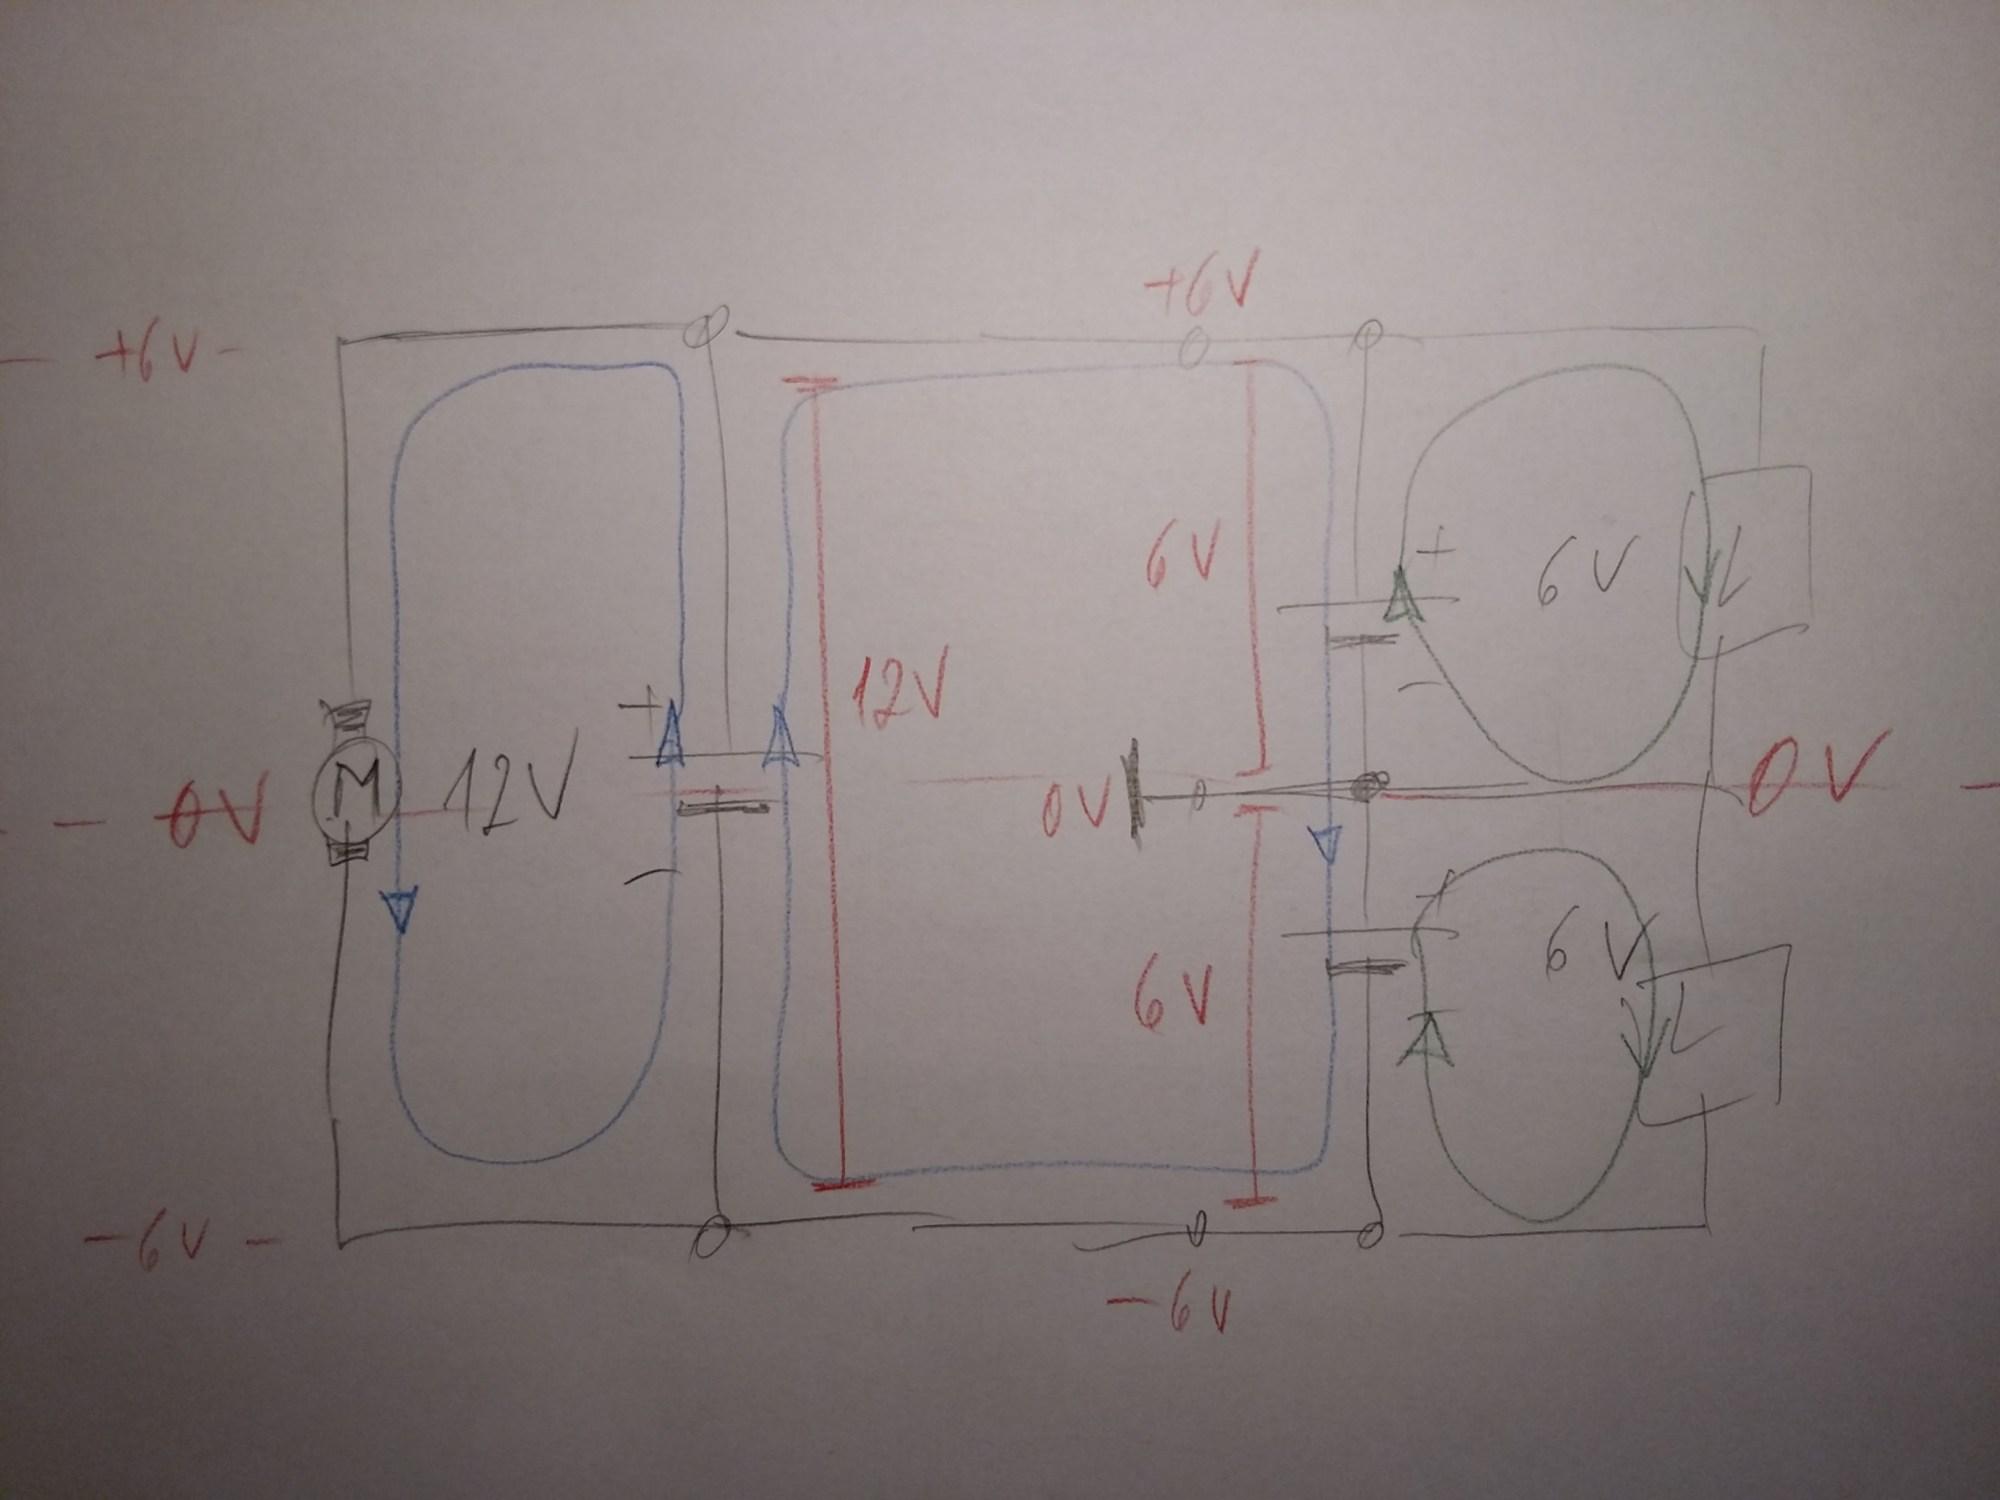 hight resolution of 12v in parallel to 6v 6v jpg435 05 kb